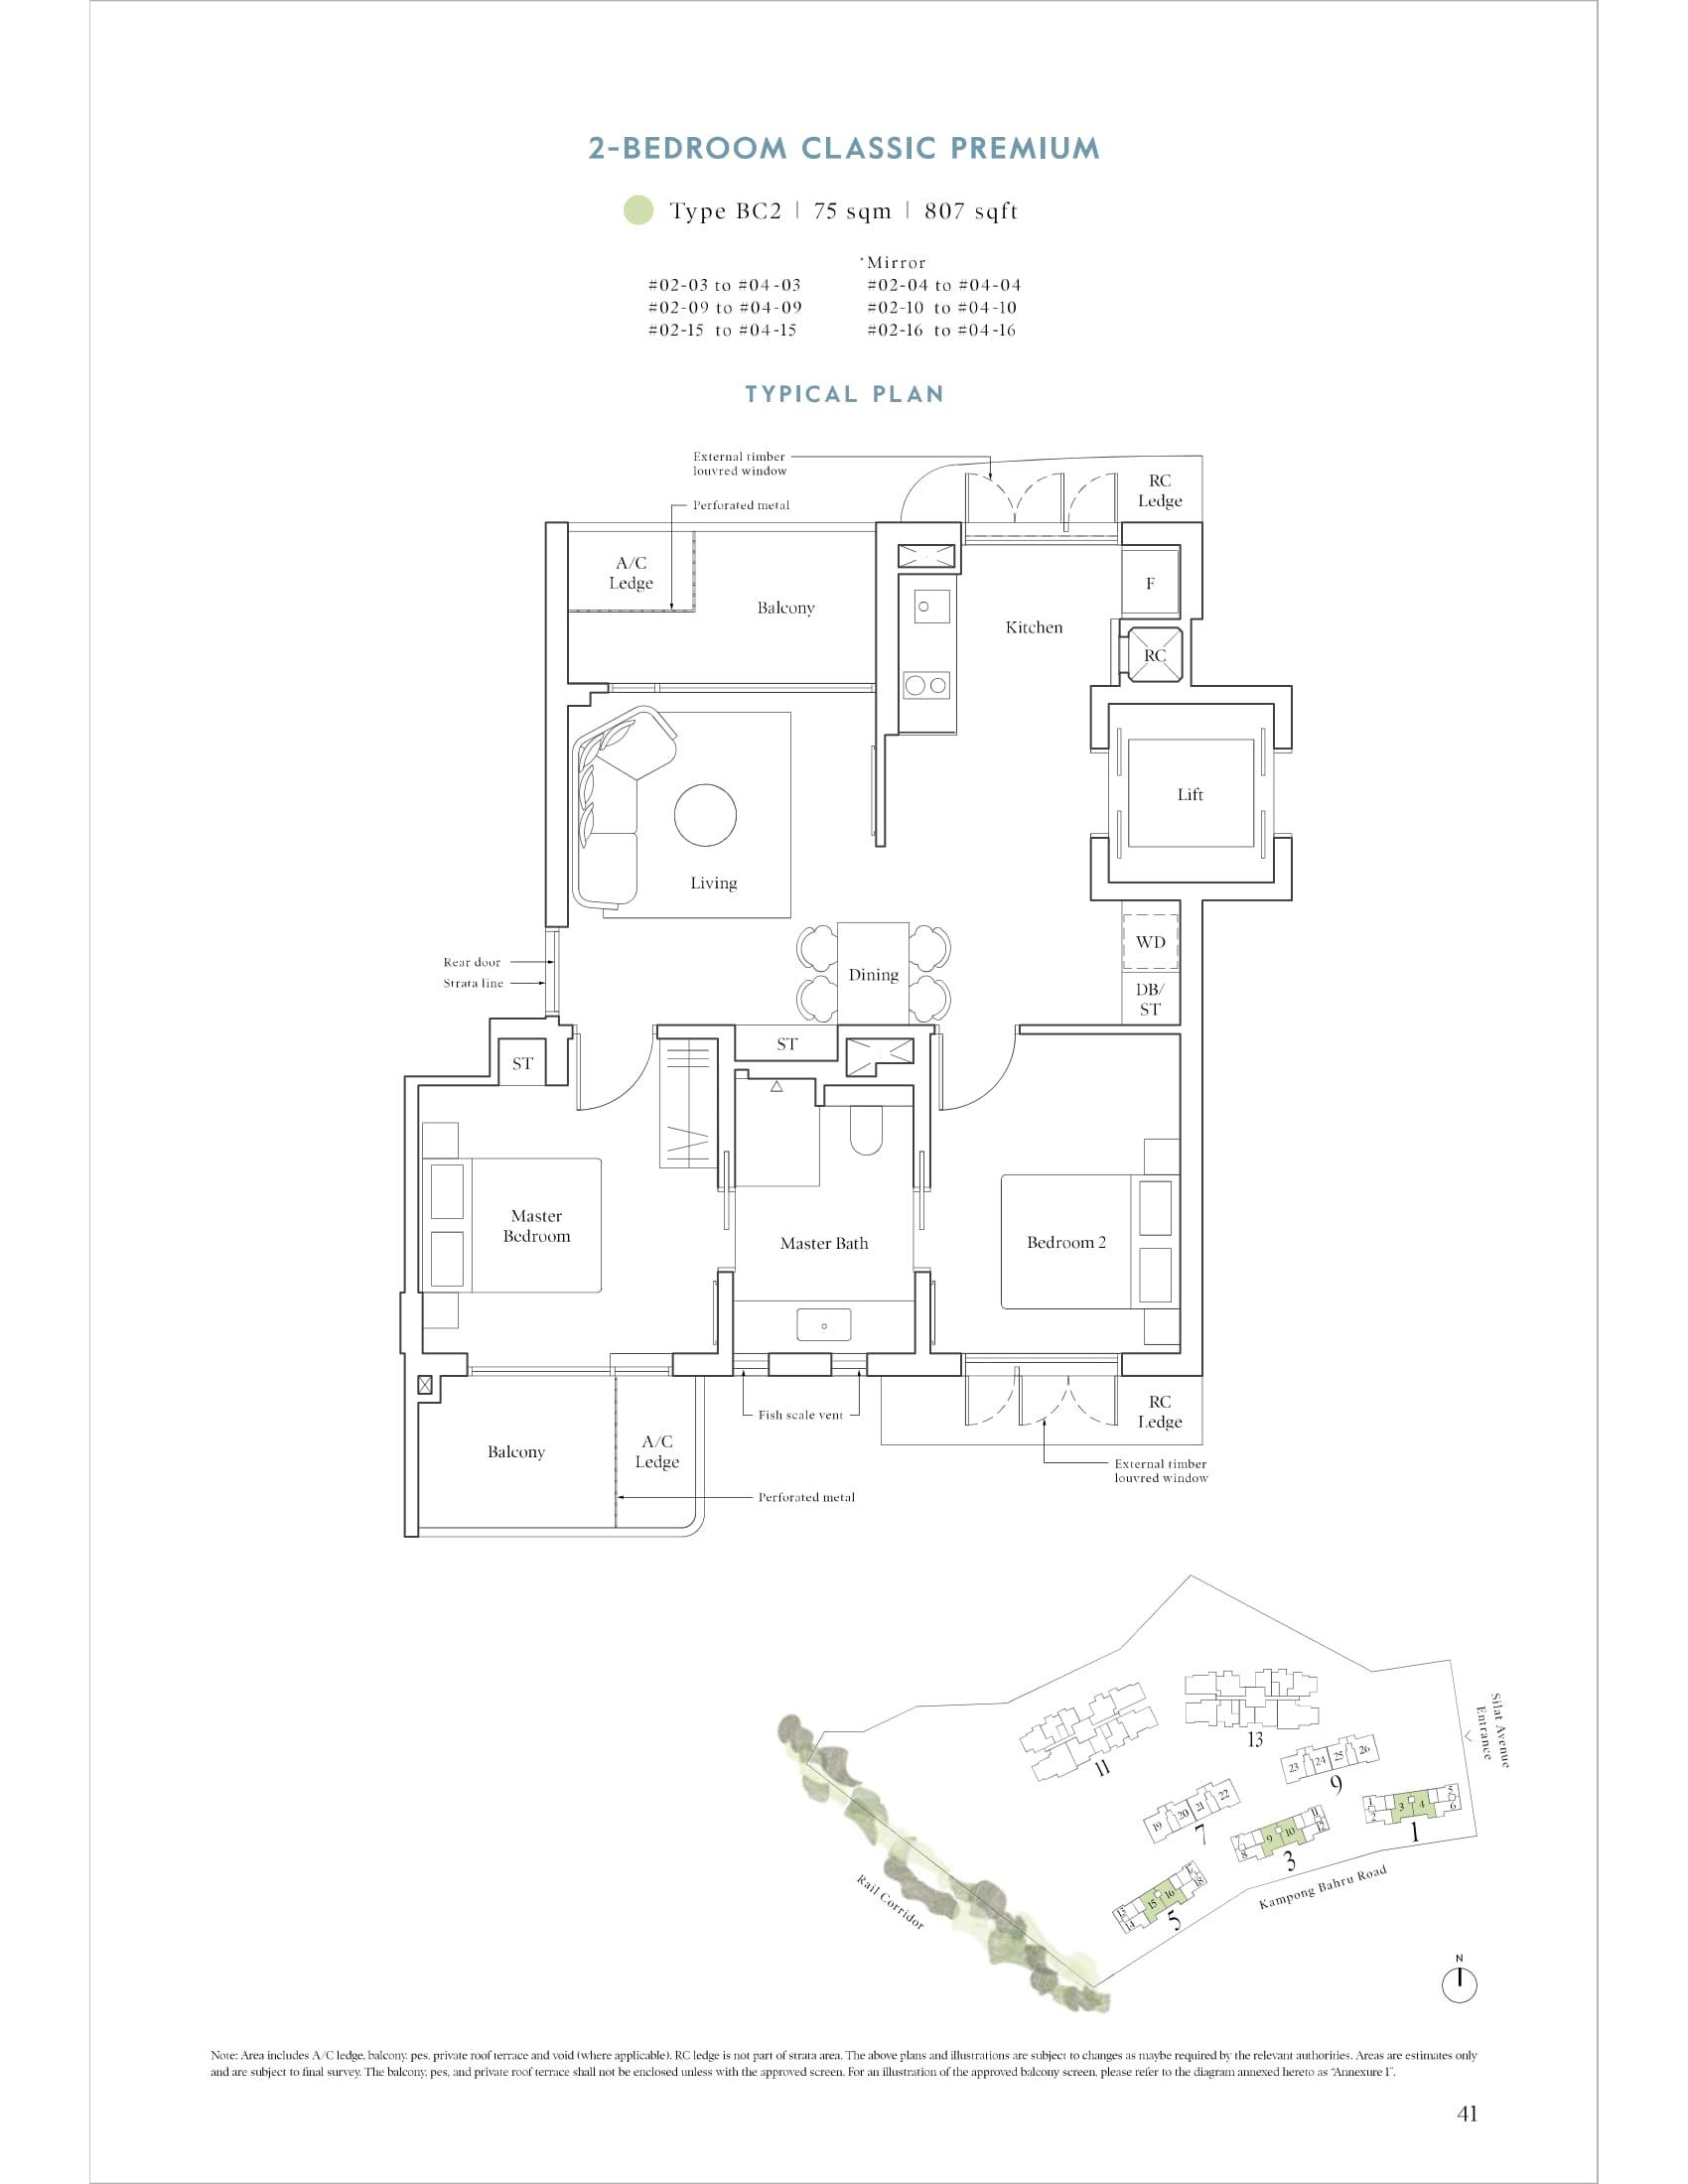 Avenue South Residence Floorplan